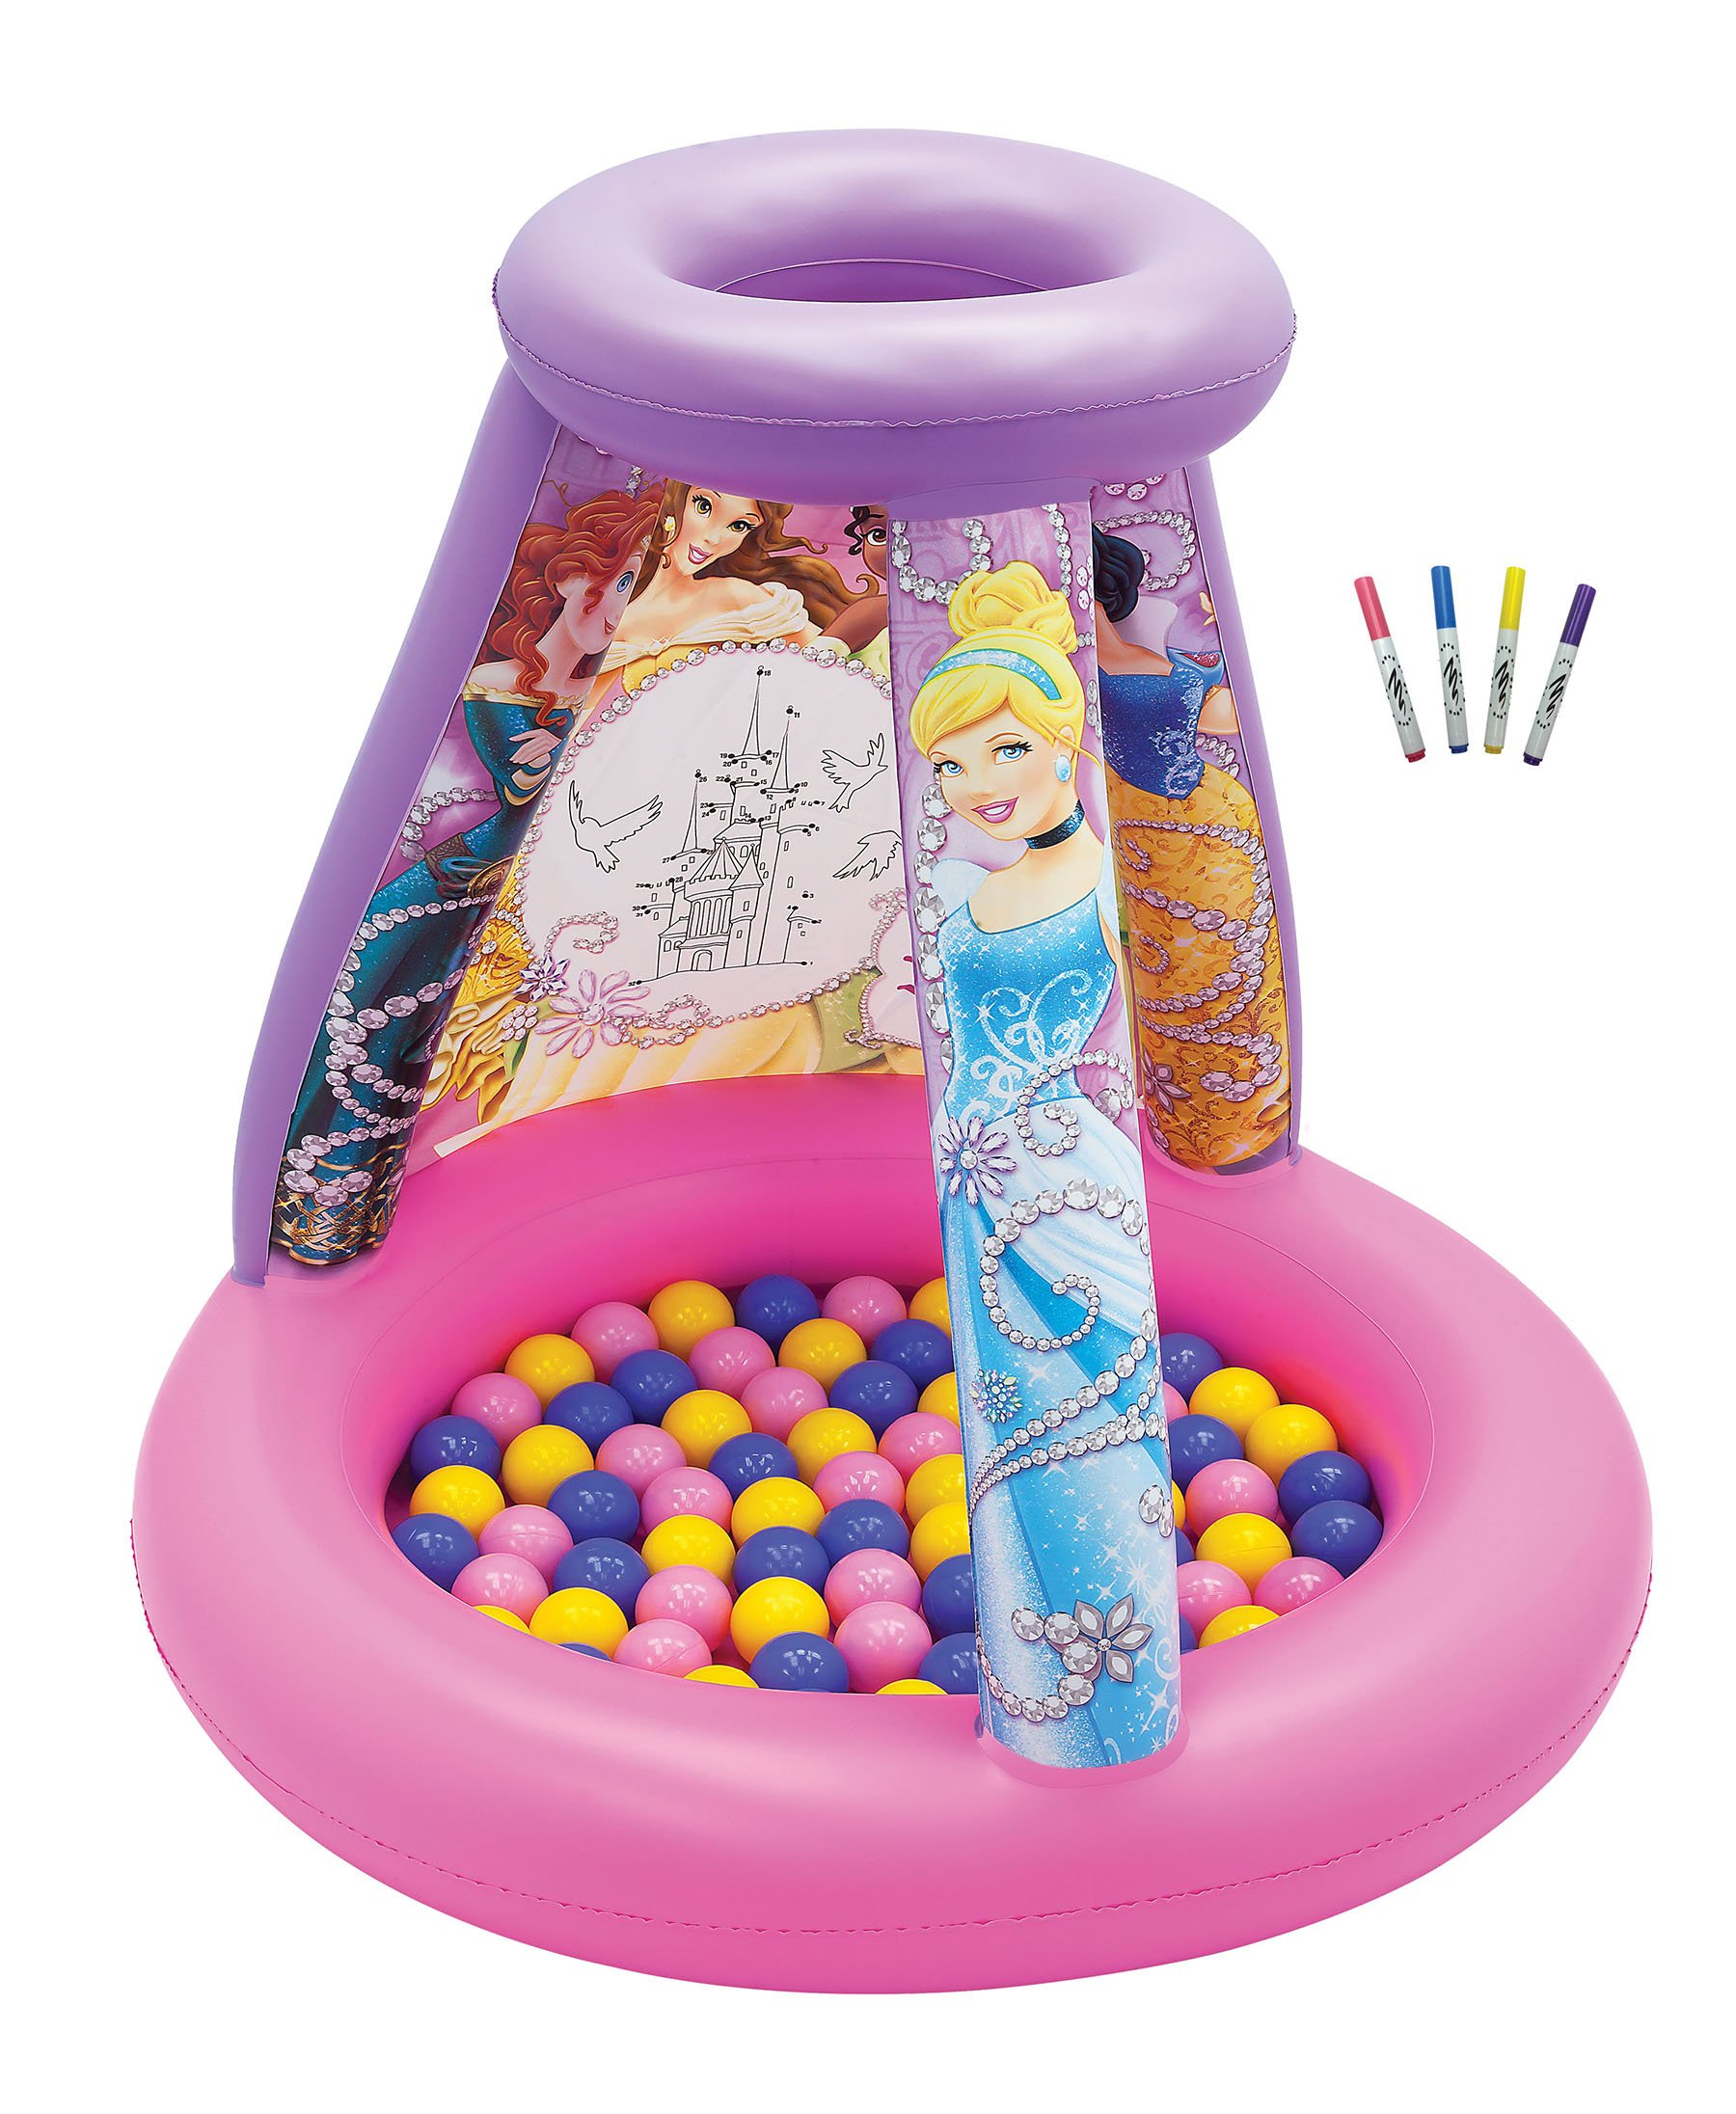 Disney Princess Color N' Play Activity Ball Pit, 1 Inflatable & 20 Sof-Flex Balls, Pink, 37'' W x 37'' D x 34'' H